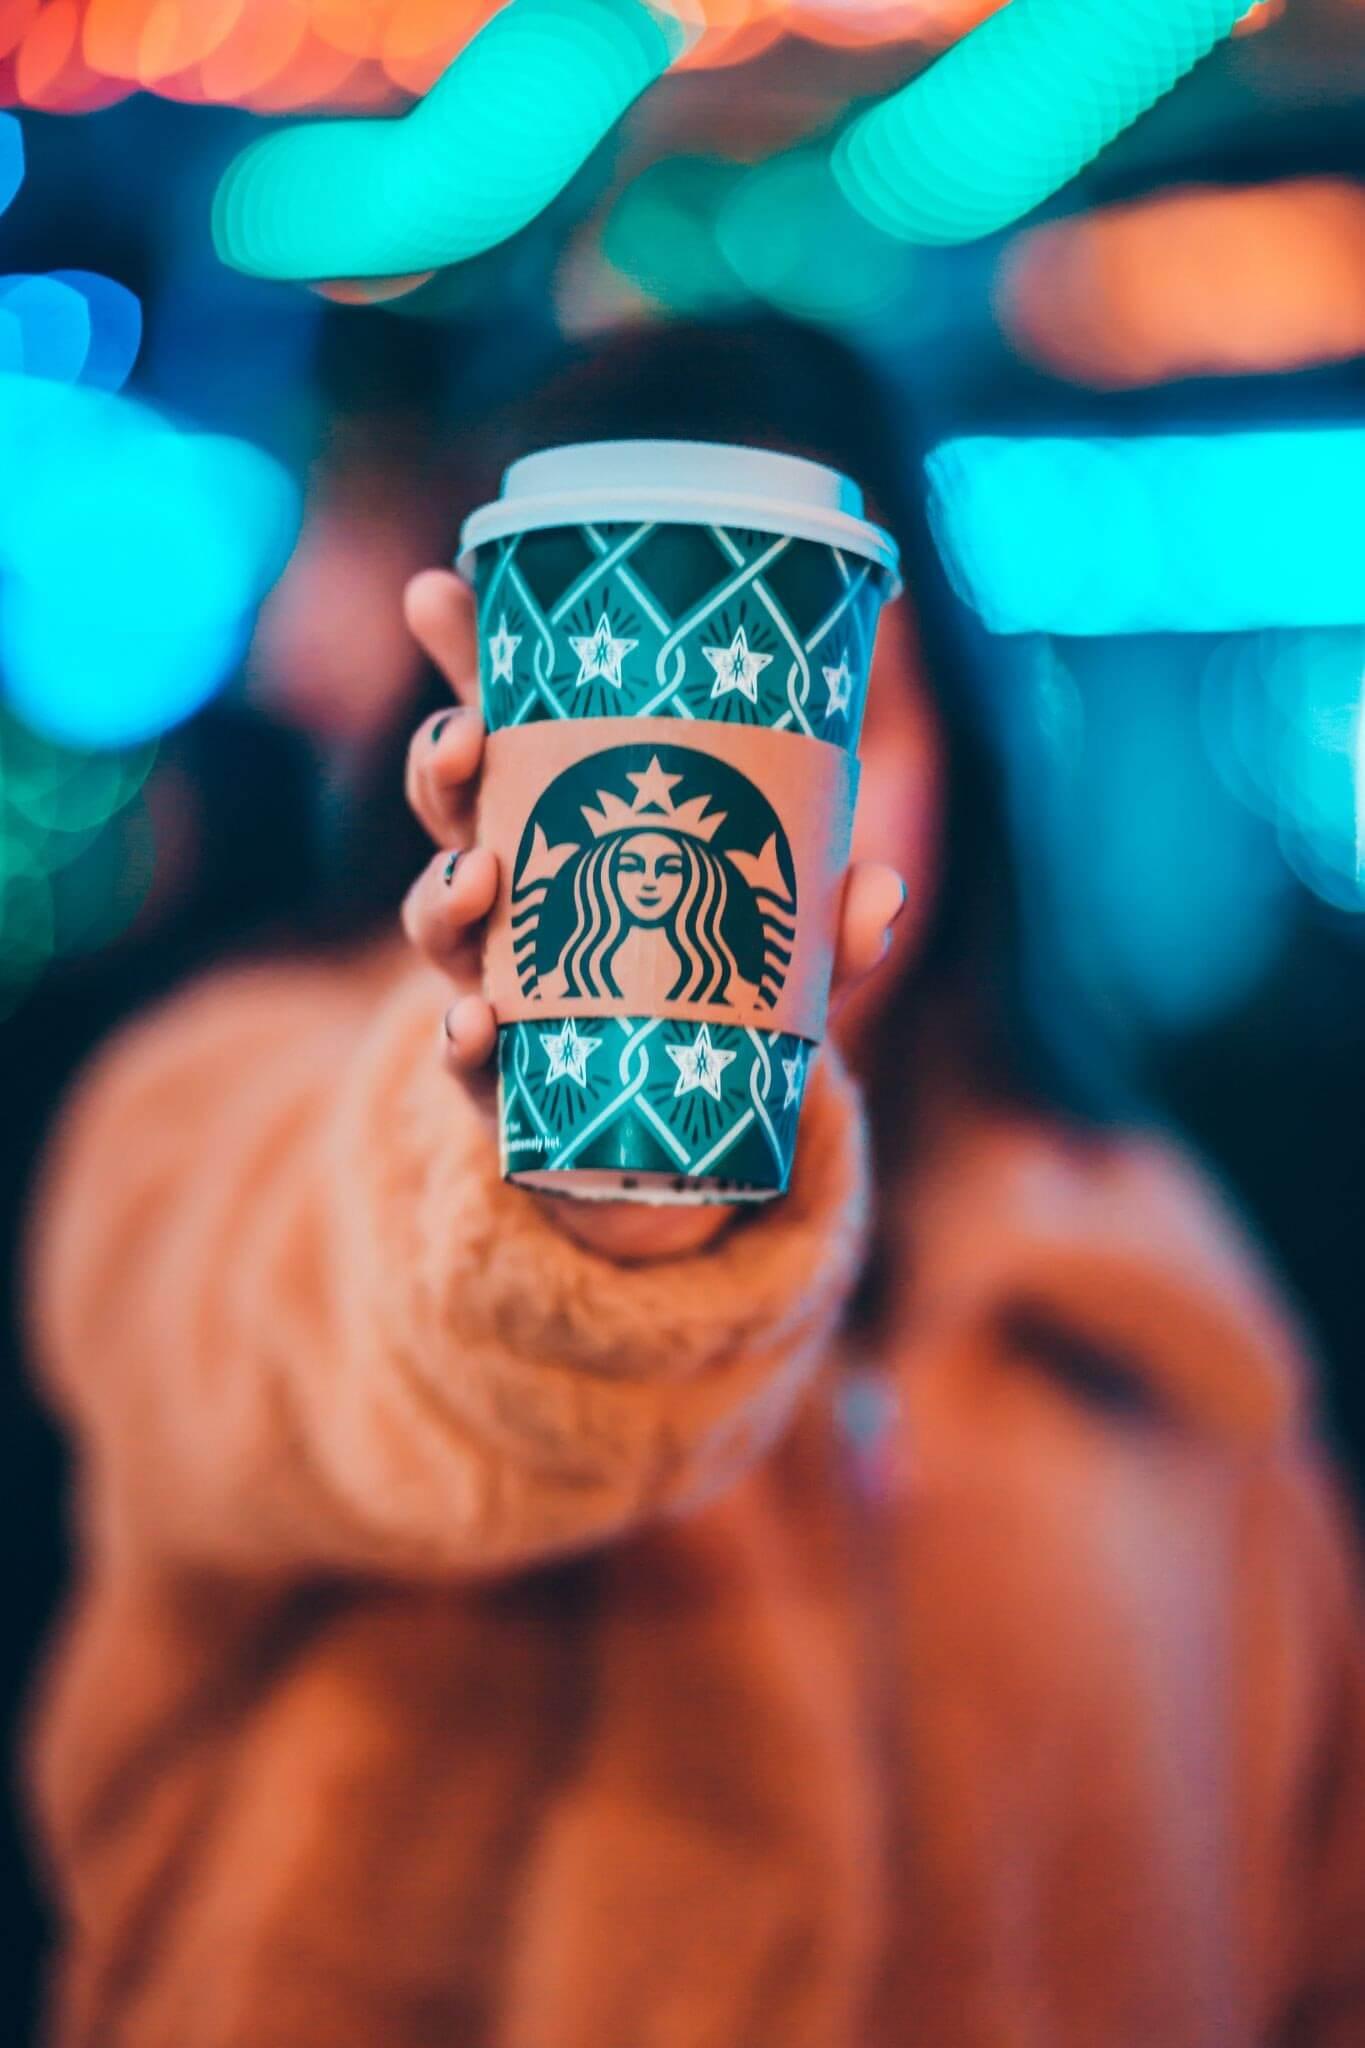 Starbucks brand ambassador holding a coffee